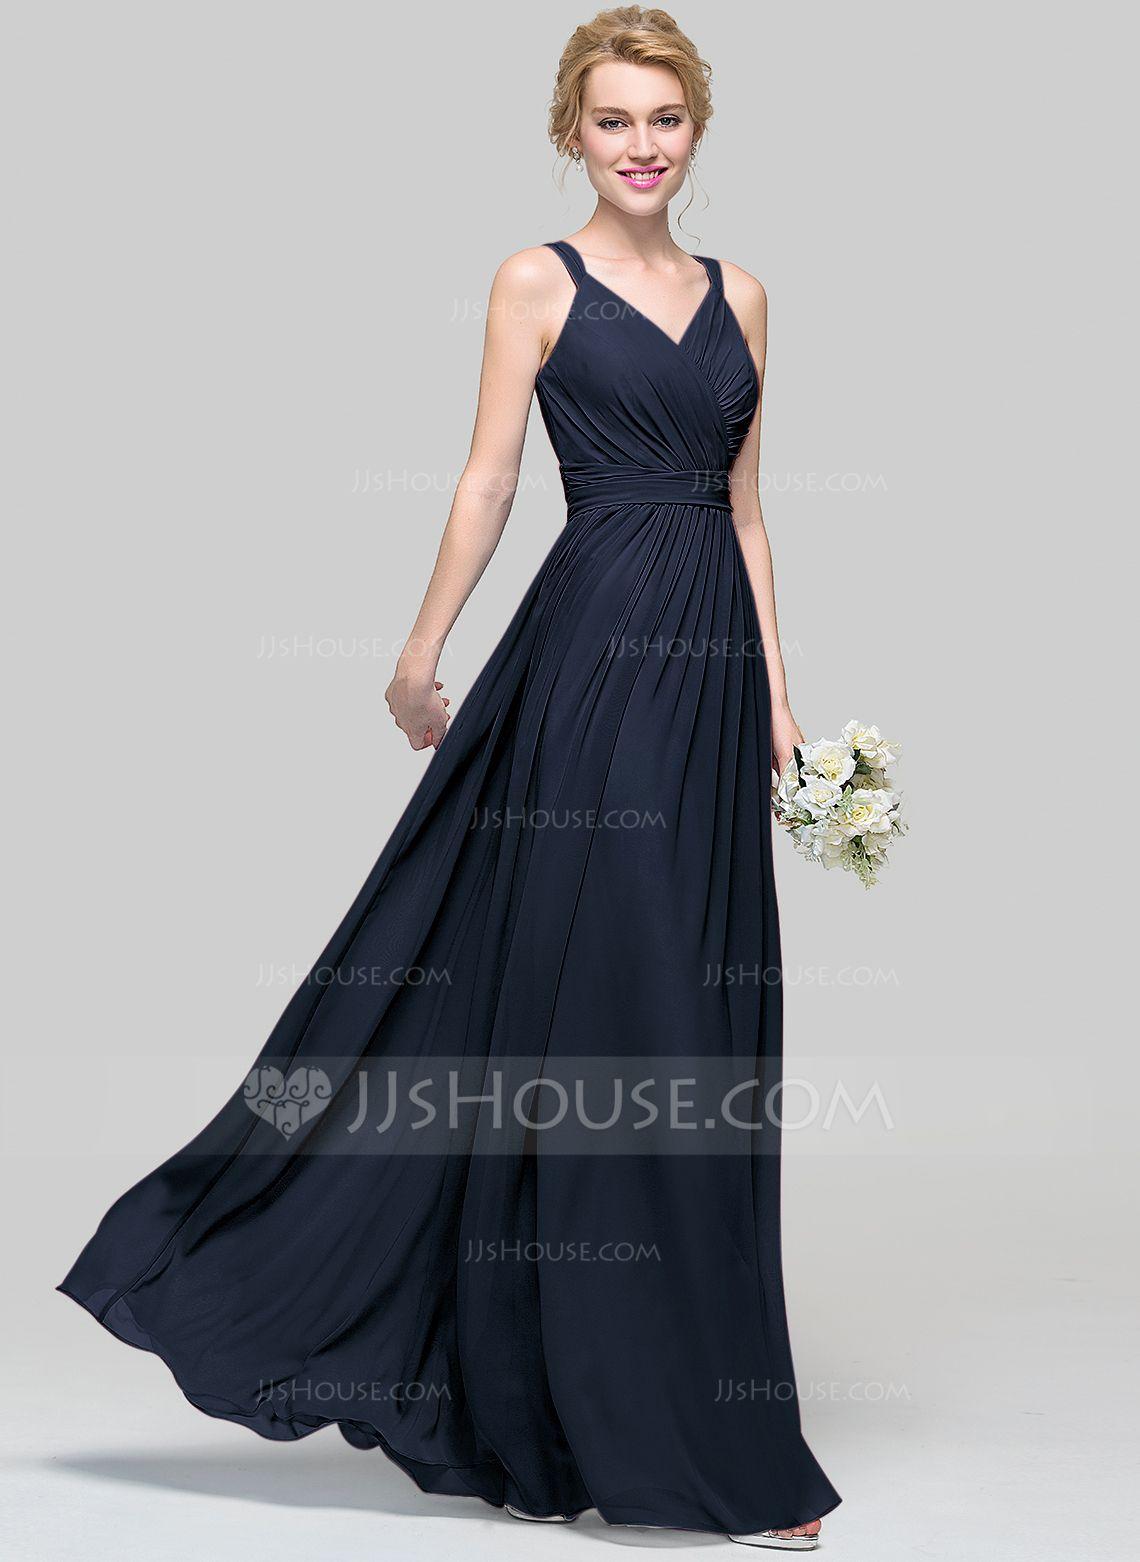 ca9a8a5c2fc Wedding Dresses Online Jjshouse - Data Dynamic AG